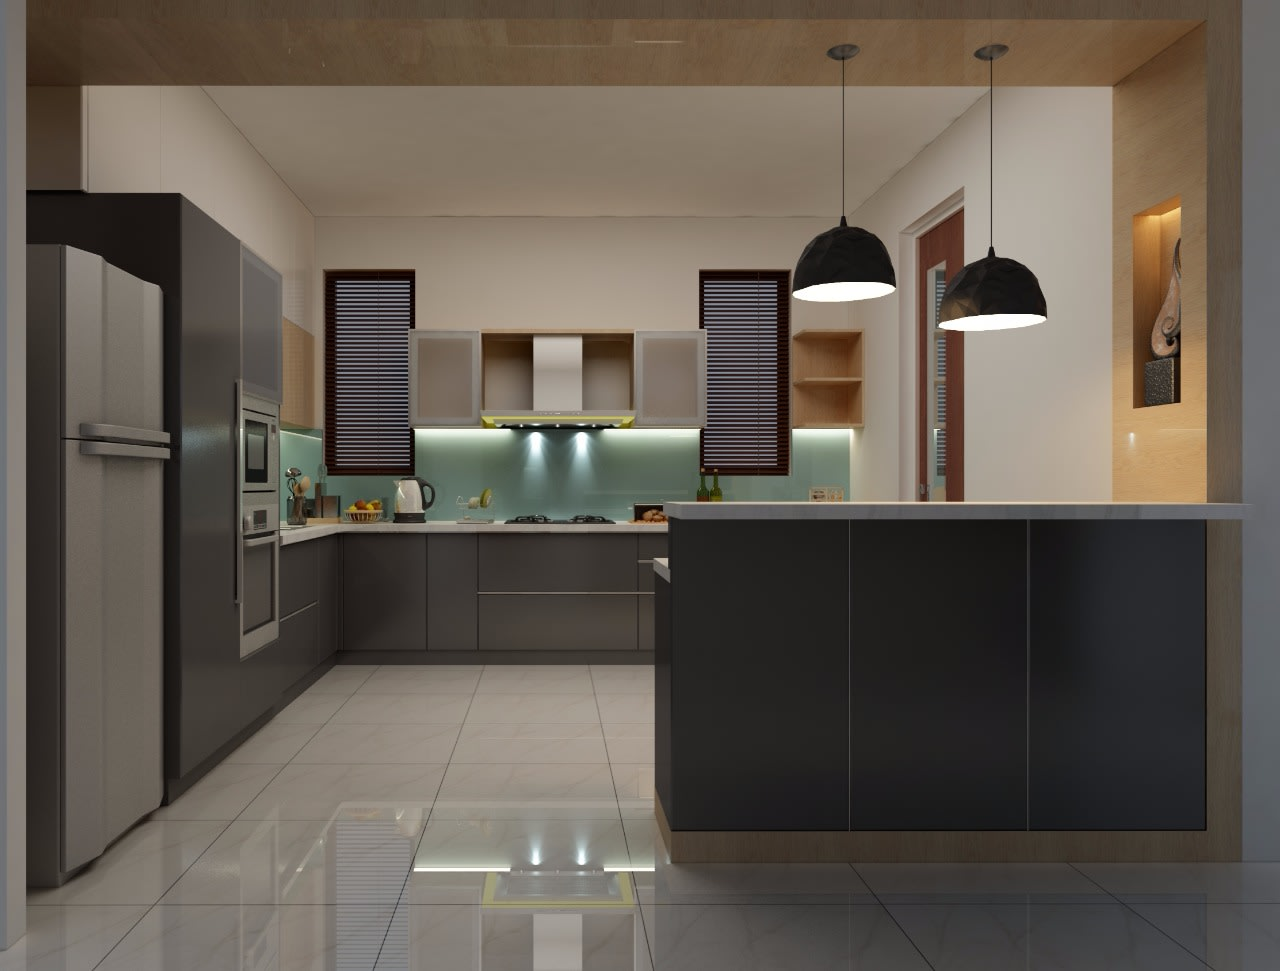 Food Zeal by Shwetha Modern | Interior Design Photos & Ideas